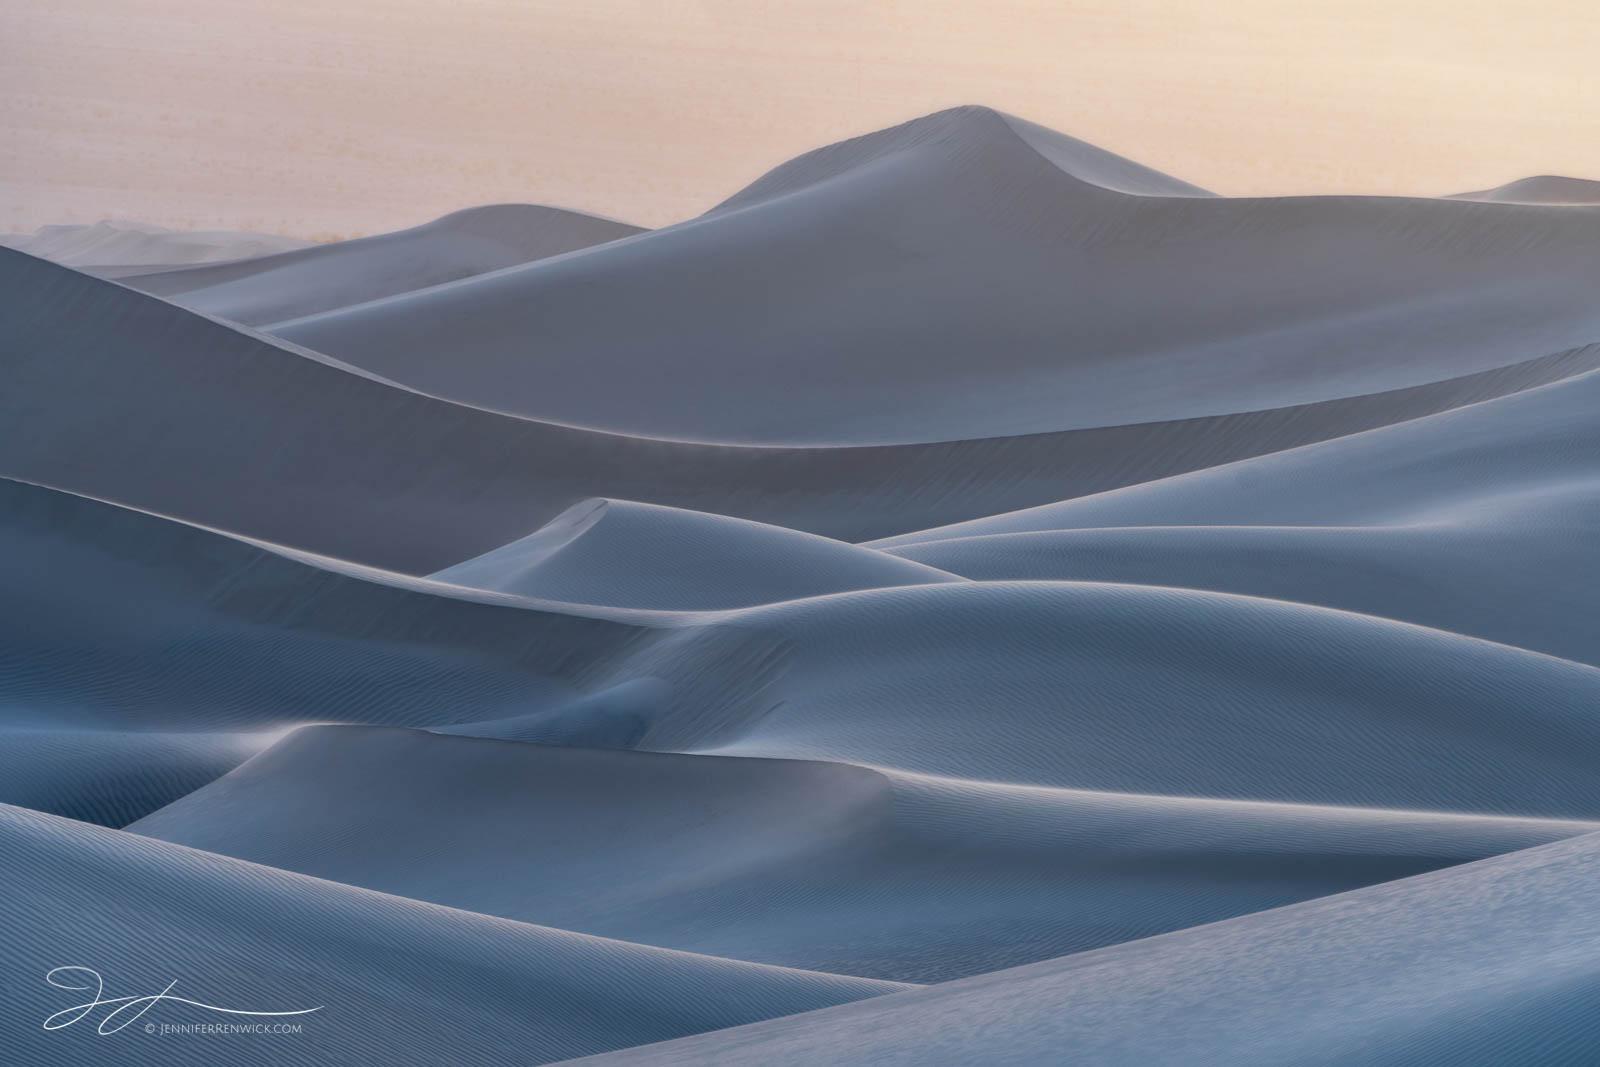 Death Valley National Park, Mojave Desert,  California, sunset, sand, backlit, Mesquite Dunes, sand, landscape, blue hour, windstorm, blowing sand, photo